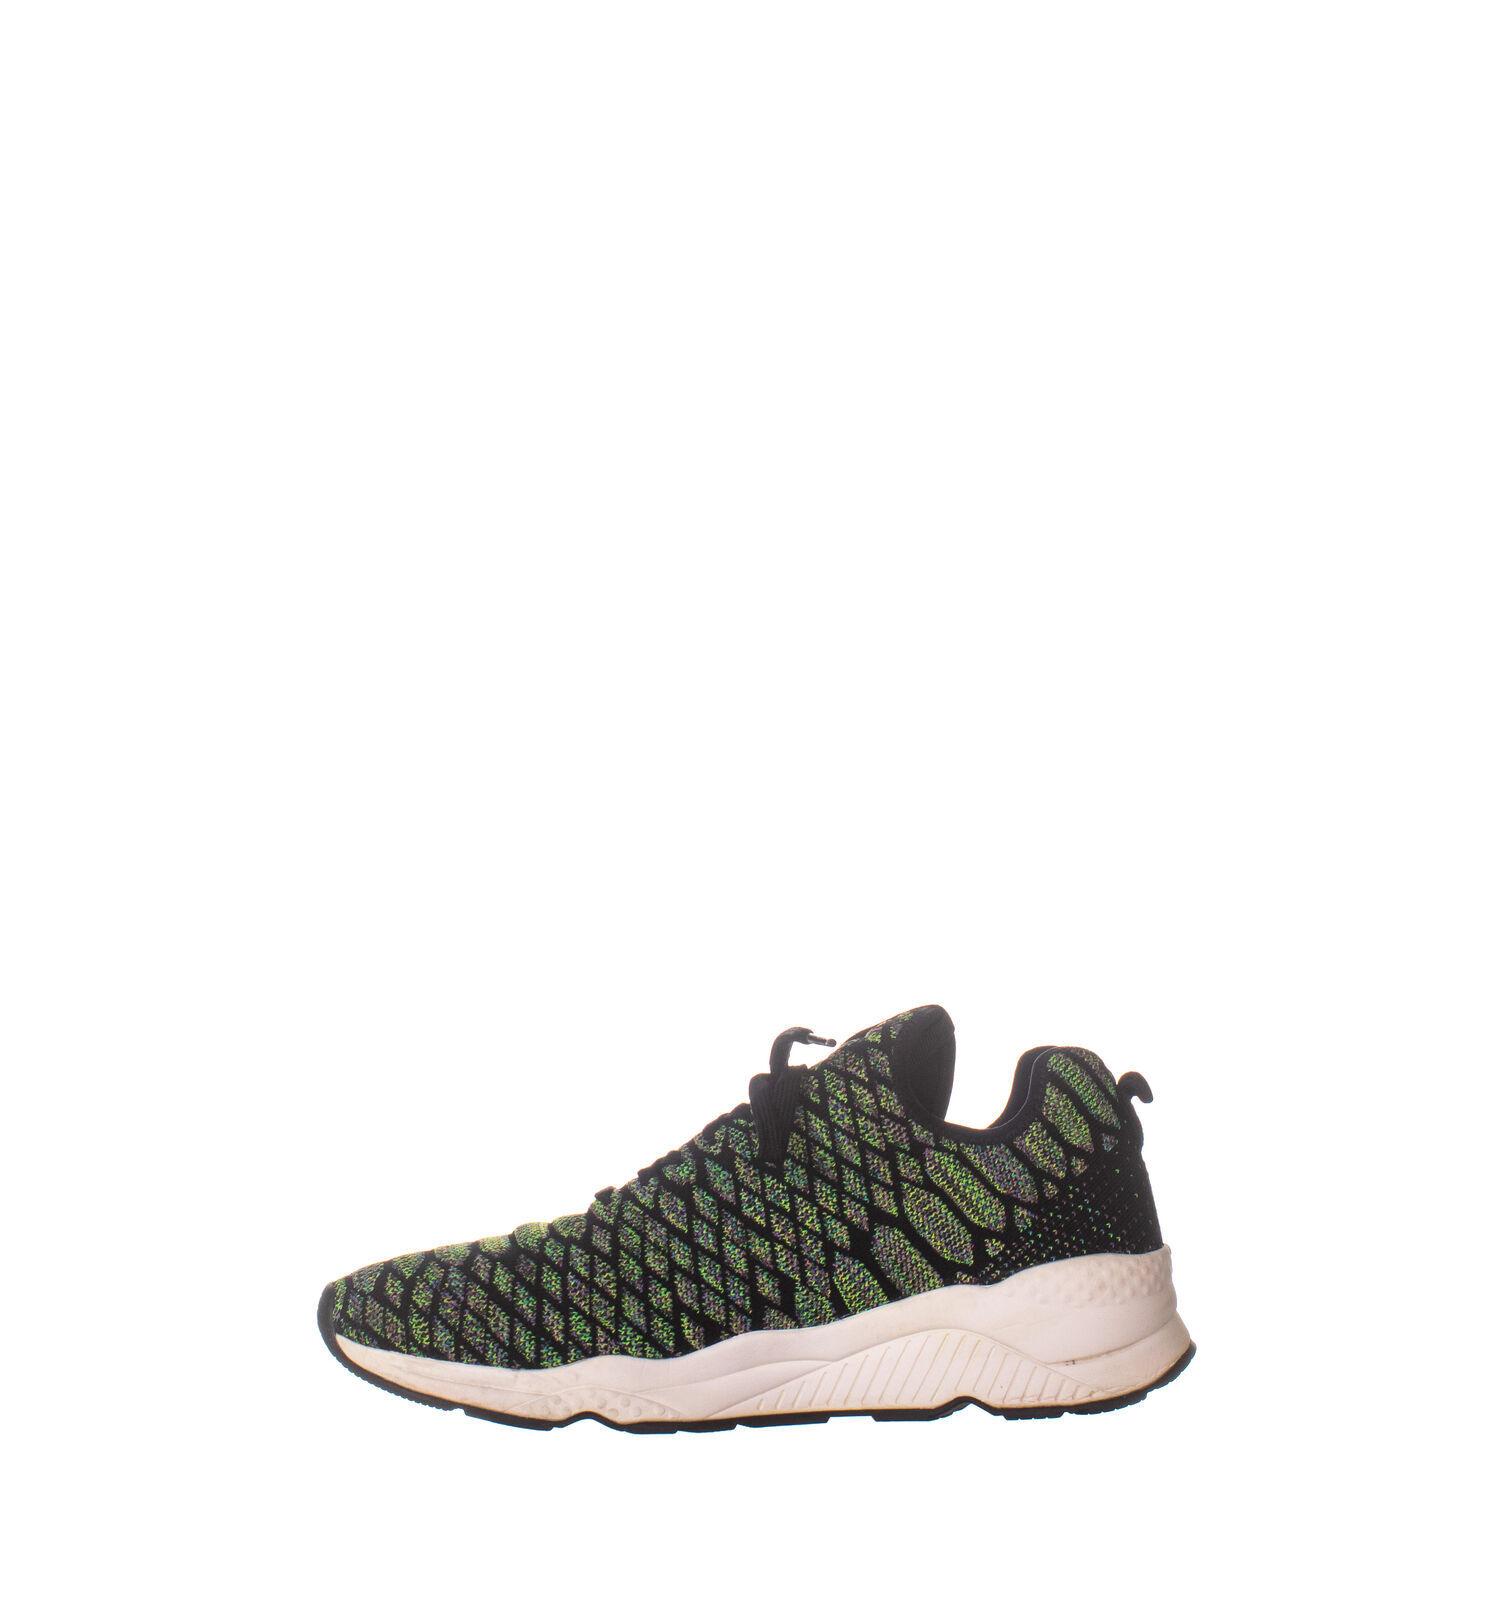 Ash 1067 Lace Up Low Top Sneakers, Green Black 069, Green Black, 41 EU